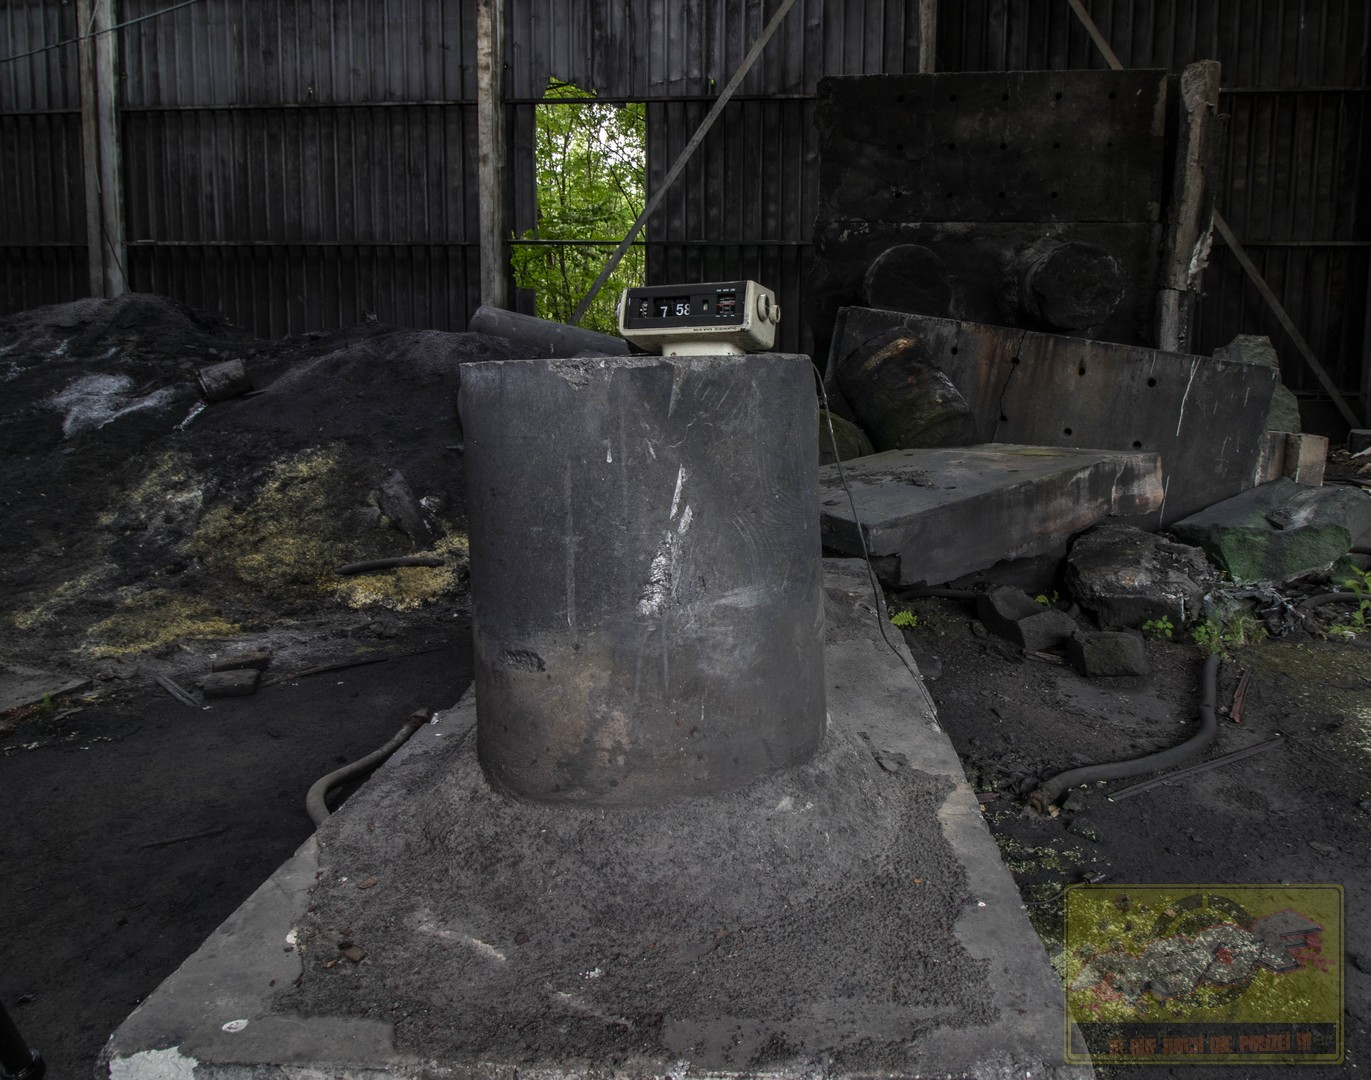 Bauxitfabrik-27.06.2020-24